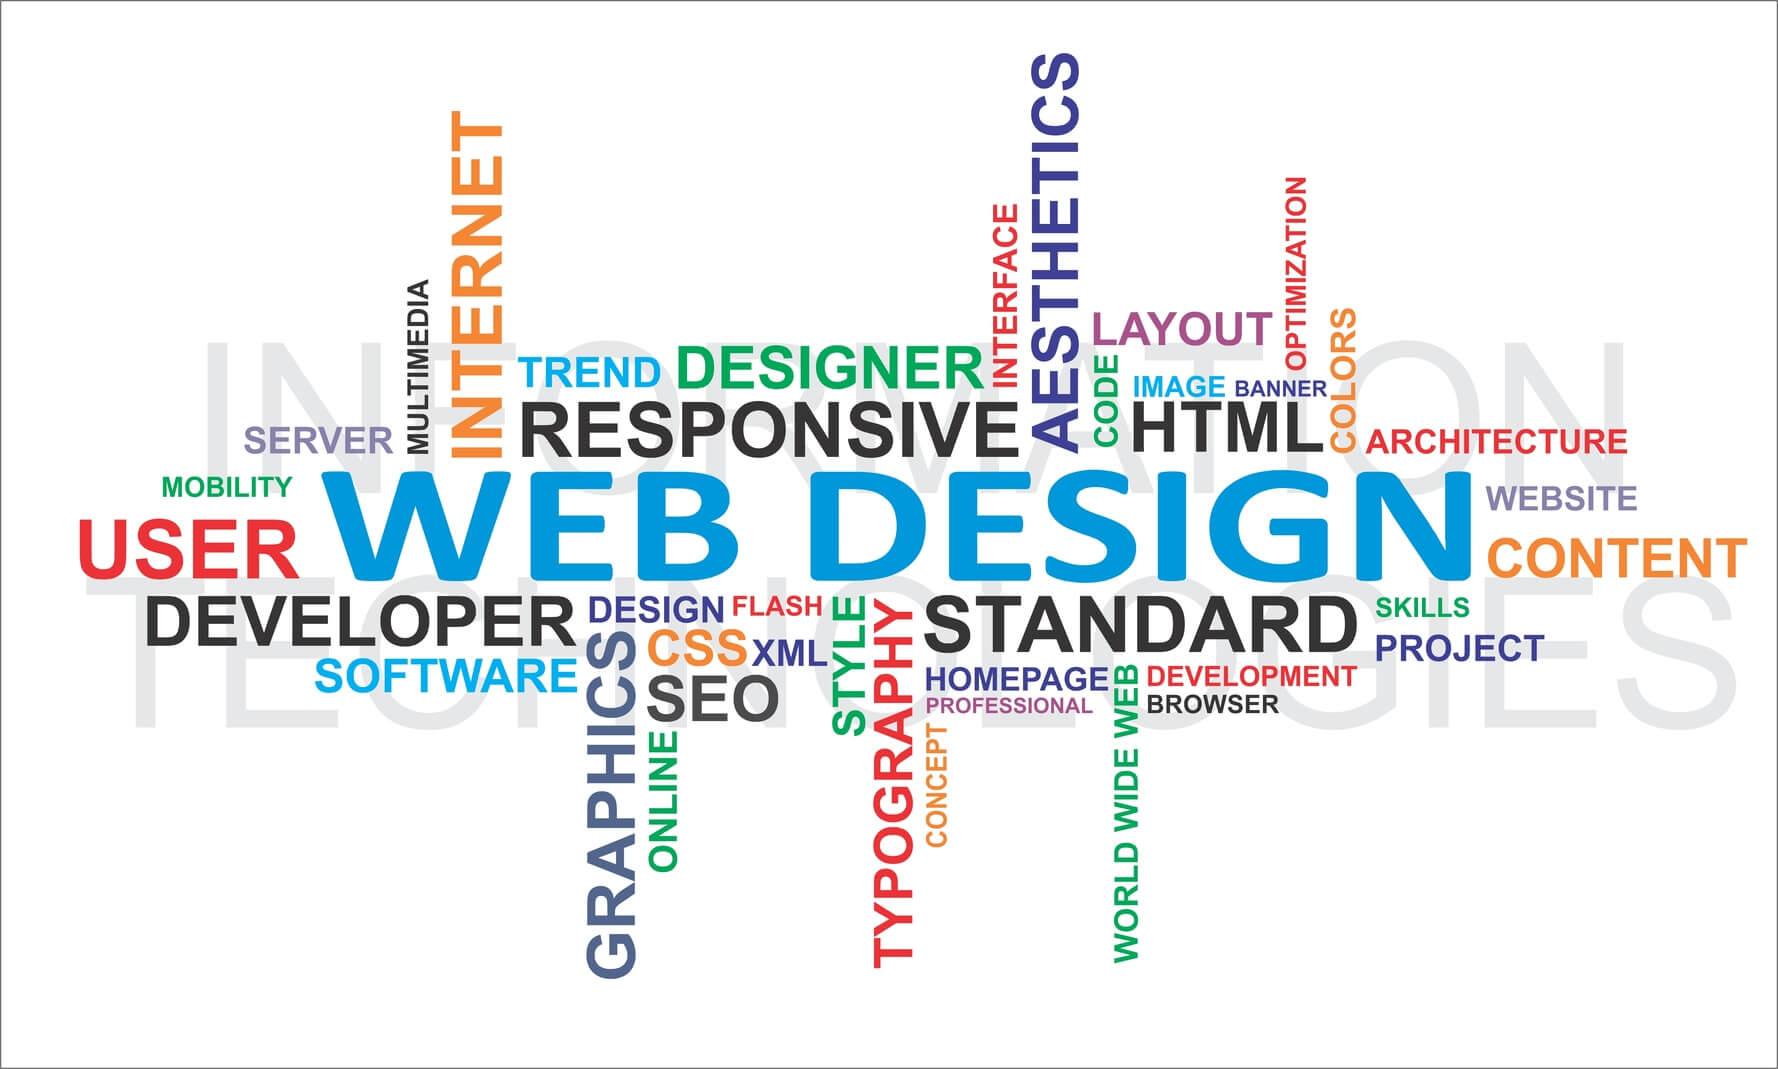 Web Design Best Practices For A Remarkable Website